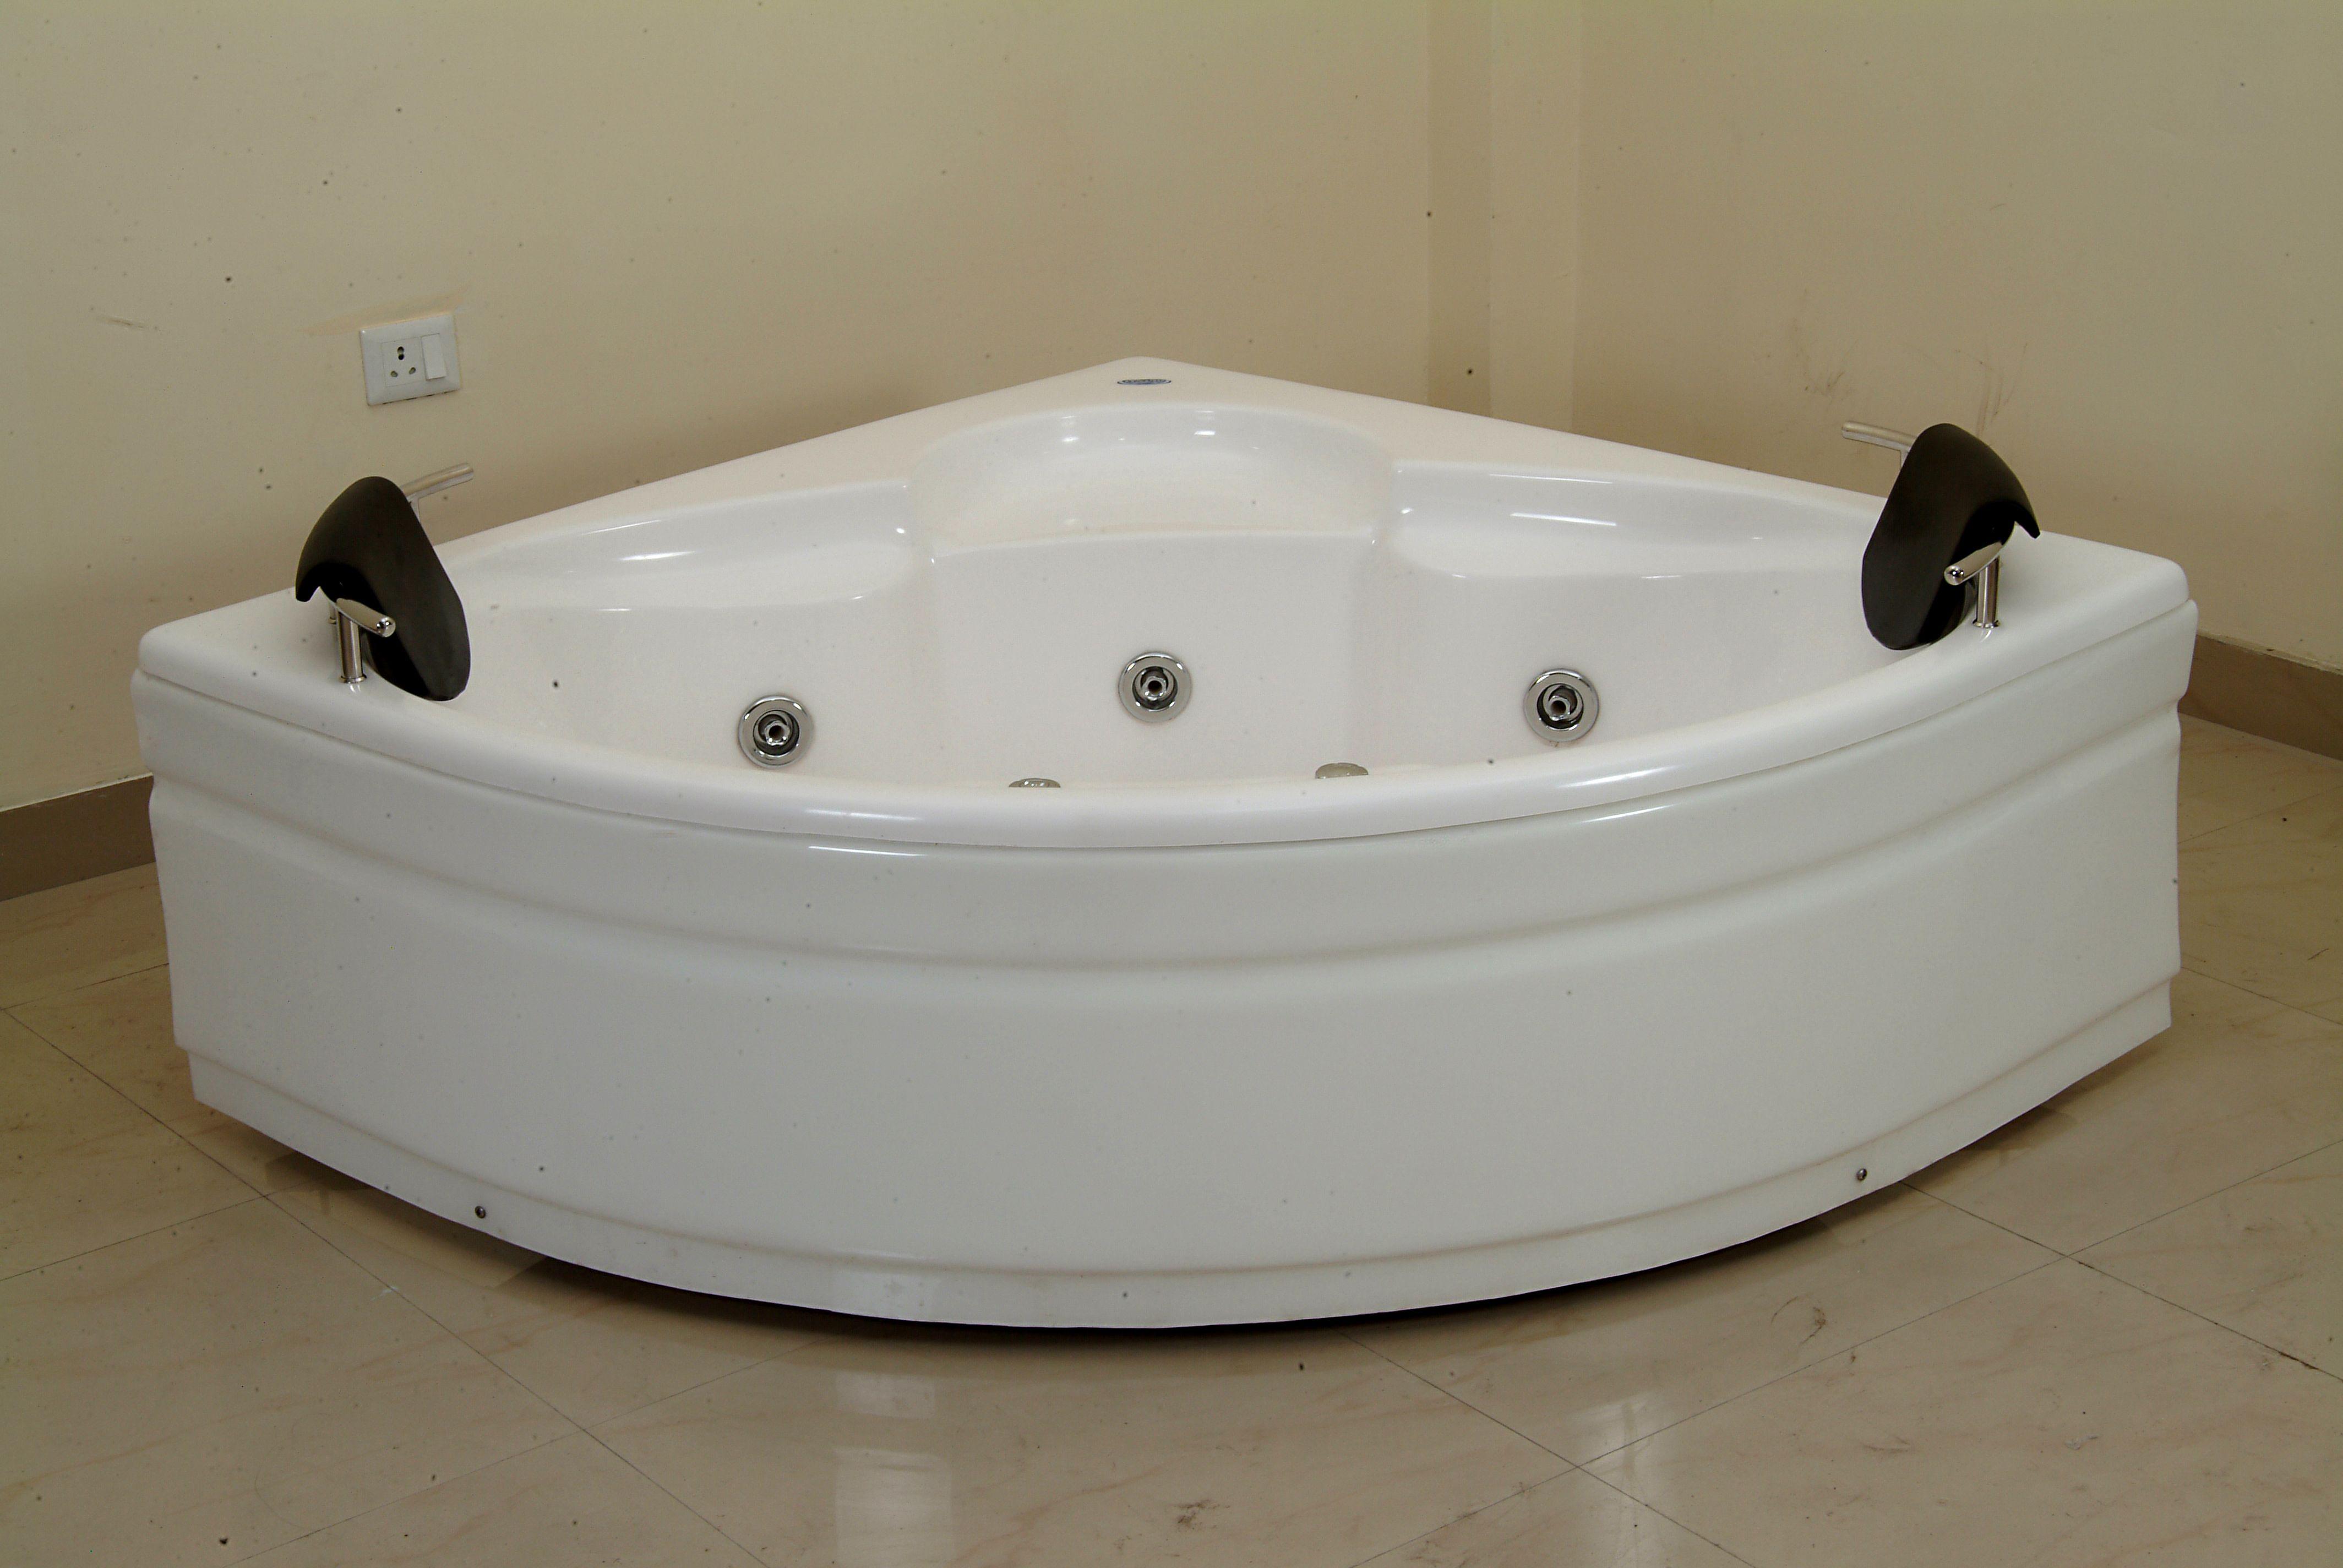 Best Jacuzzi Bathtub In India With Images Jacuzzi Bathtub